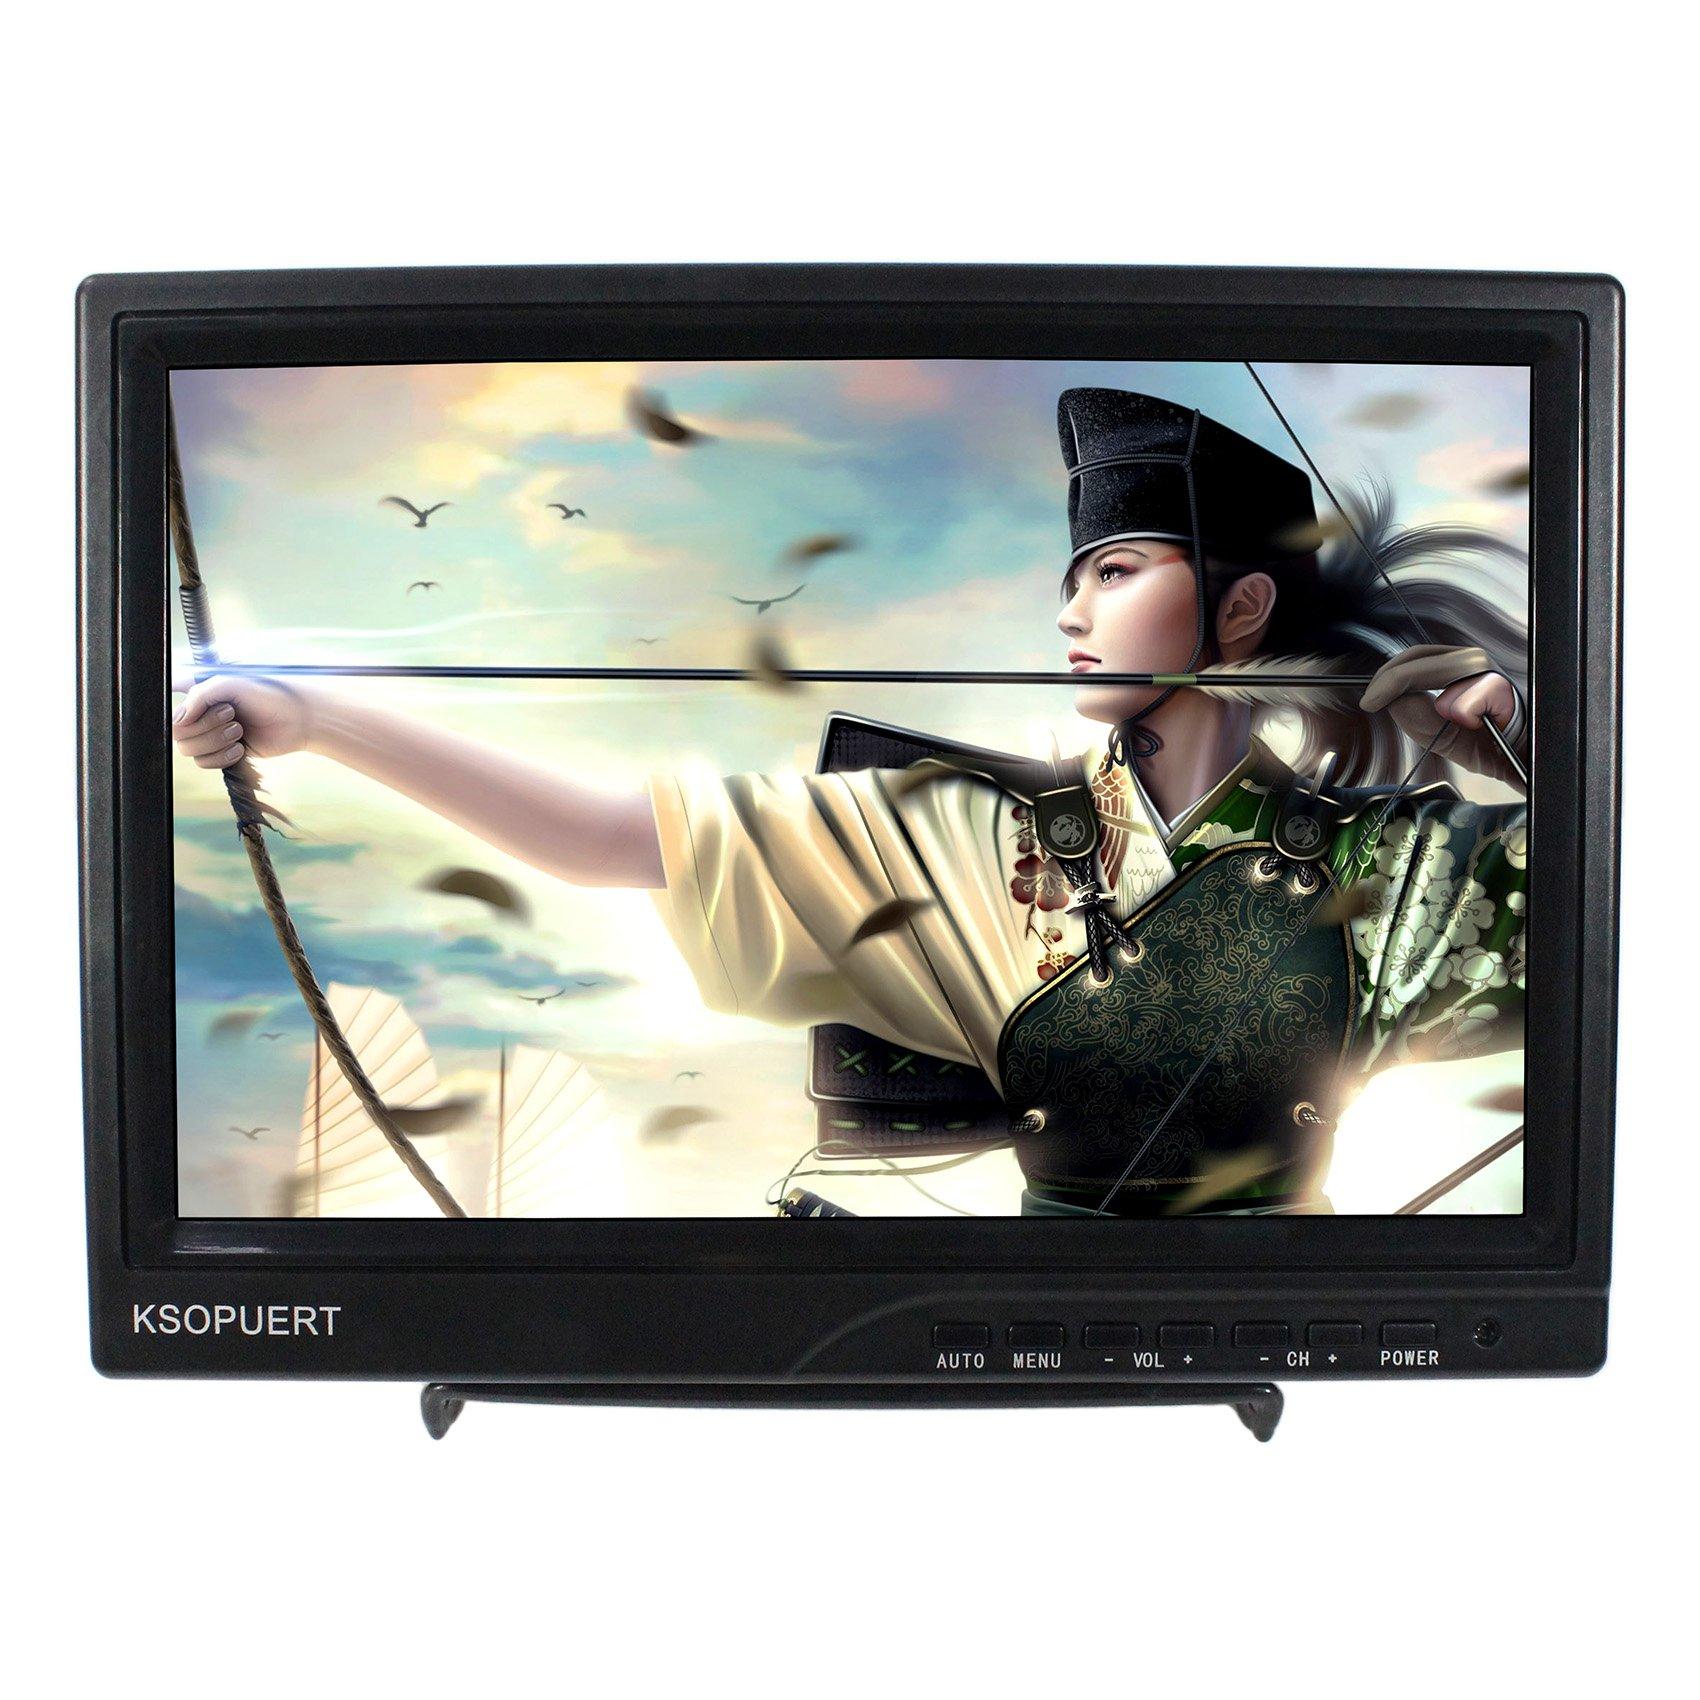 10.1'' 1366x768 HD IPS LCD Monitor HDMI VGA CVBS USB Input Eearphone Speaker Suitable For Extra Raspberry Pi Monitor Game Monitor